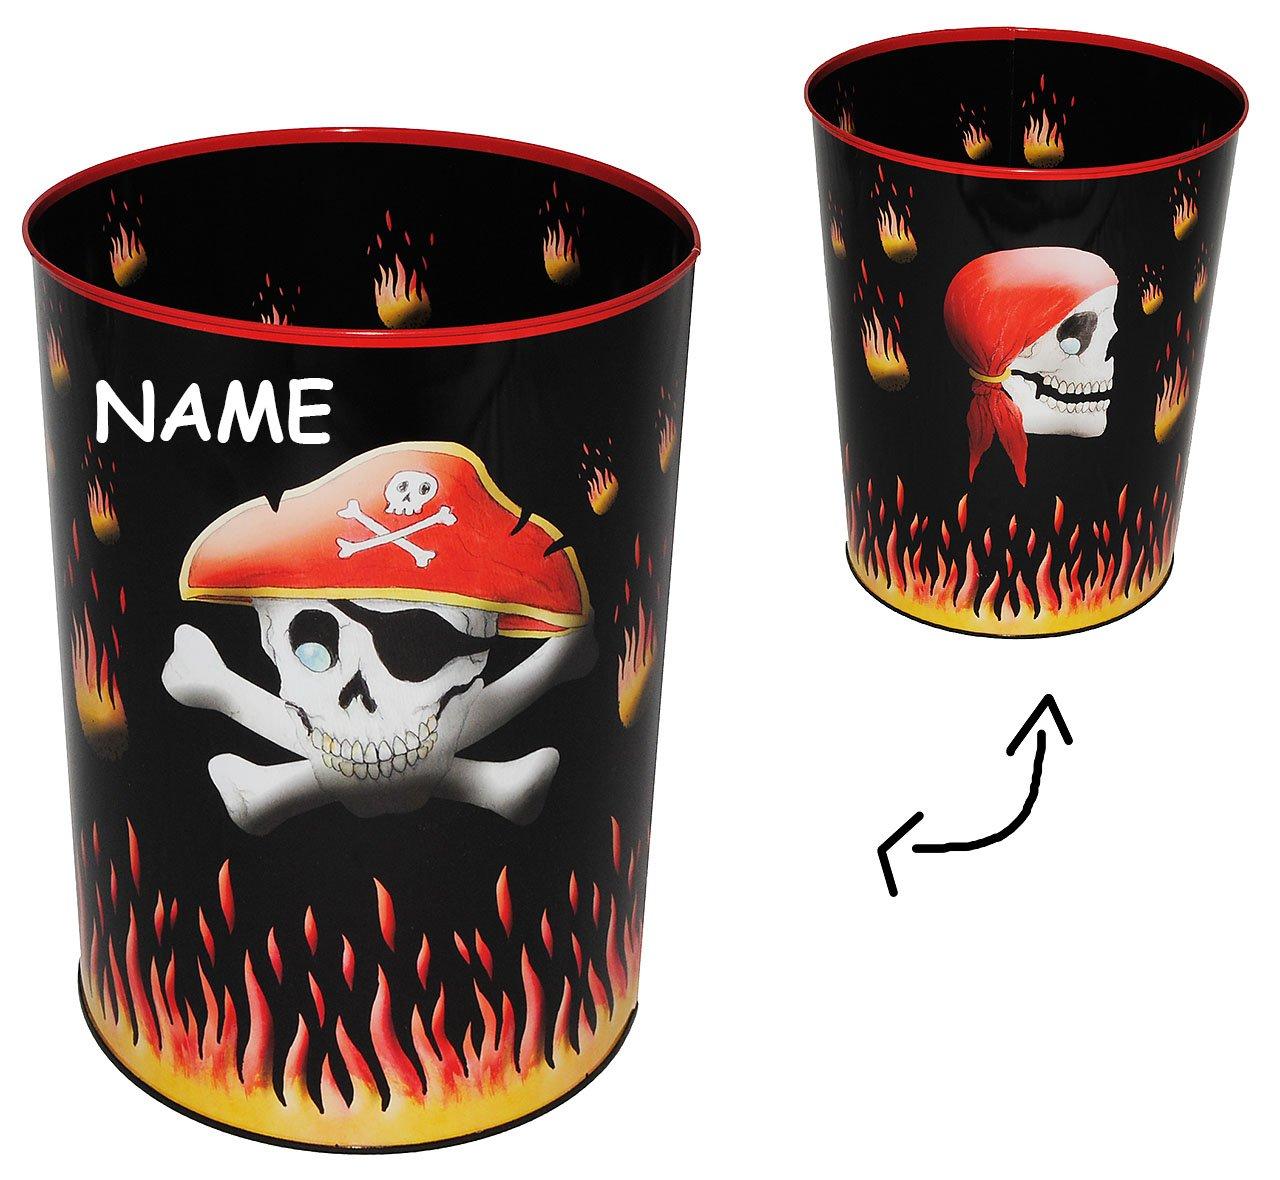 Unbekannt Papierkorb Pirat Totenkopf - Metall - incl. Name - Mülleimer Eimer - Schatztruhe / Abfallbehälter / Abfalleimer Kinderzimmer - Piraten Seefahrer - Aufbewahrungsbox für Kinder Jungen Kinder-land